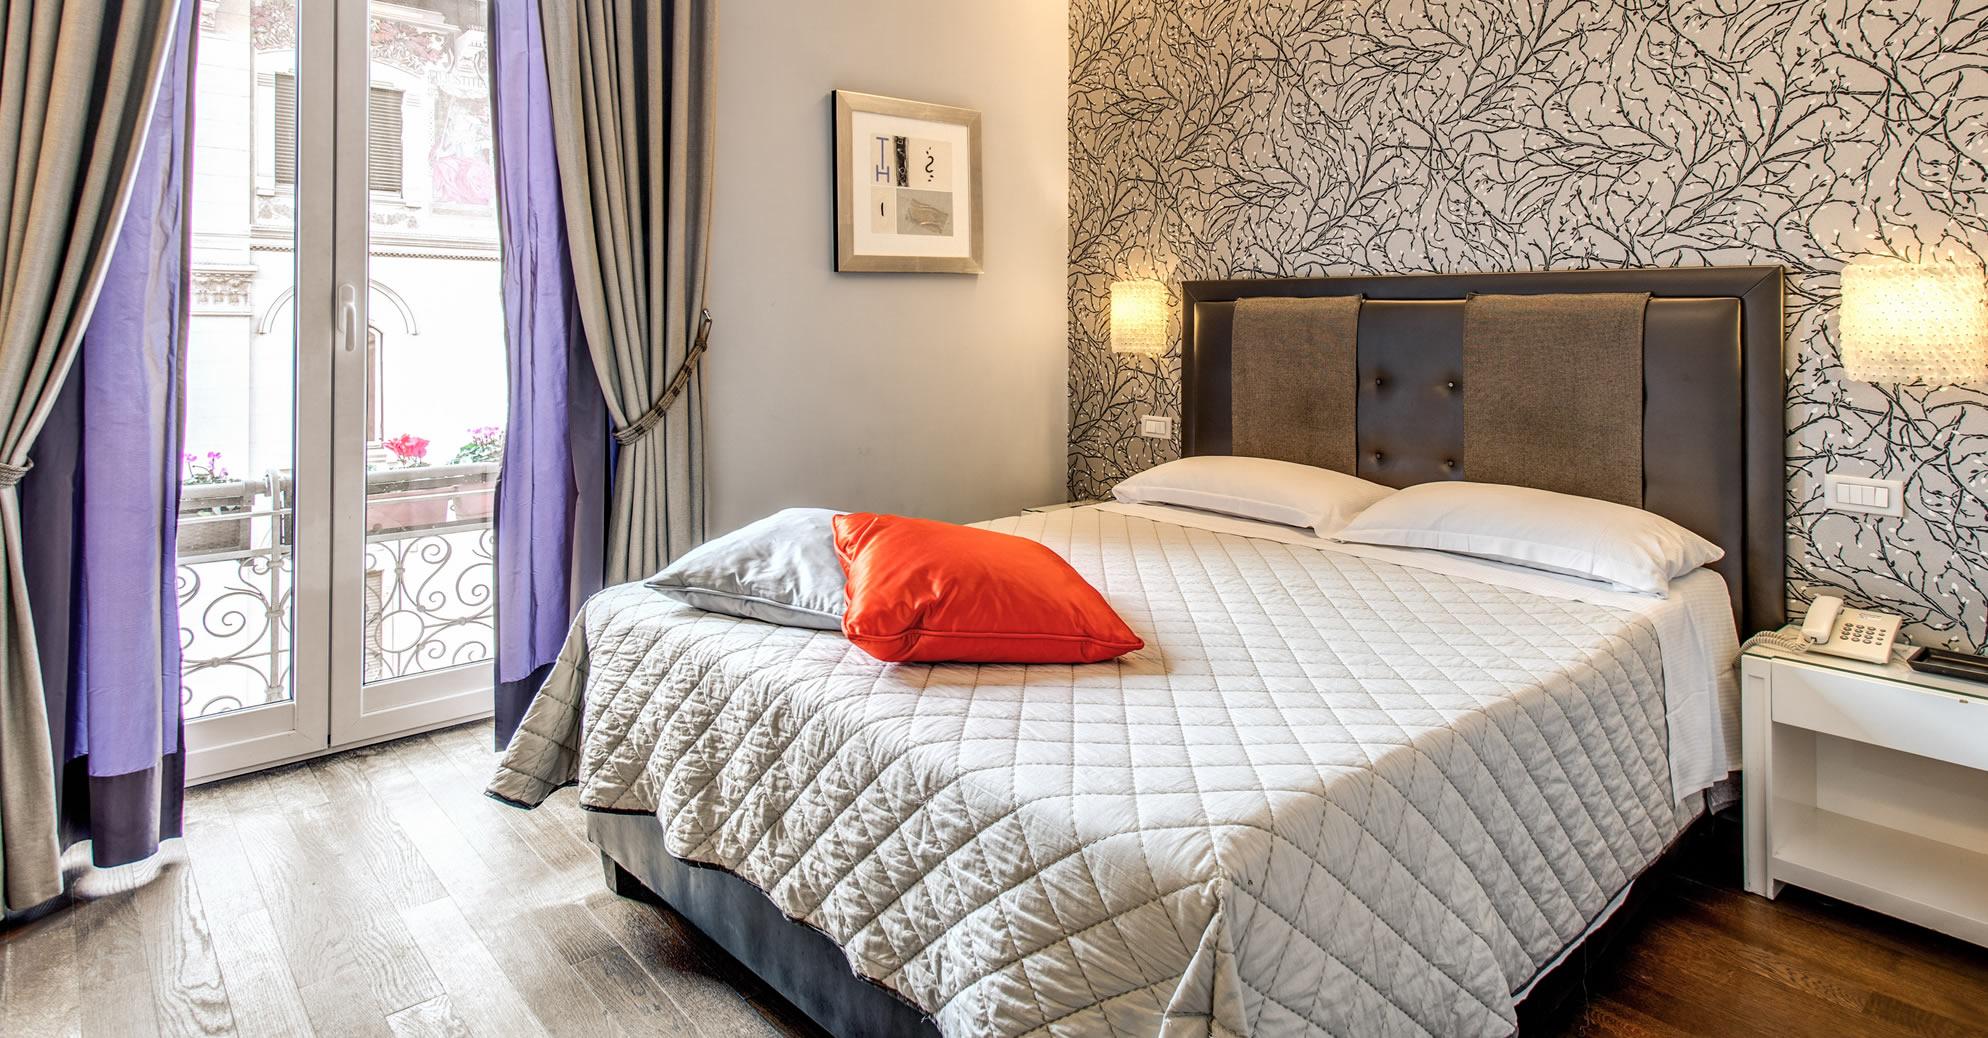 Boutique guesthouse roma four star city centre for Hotel beautique